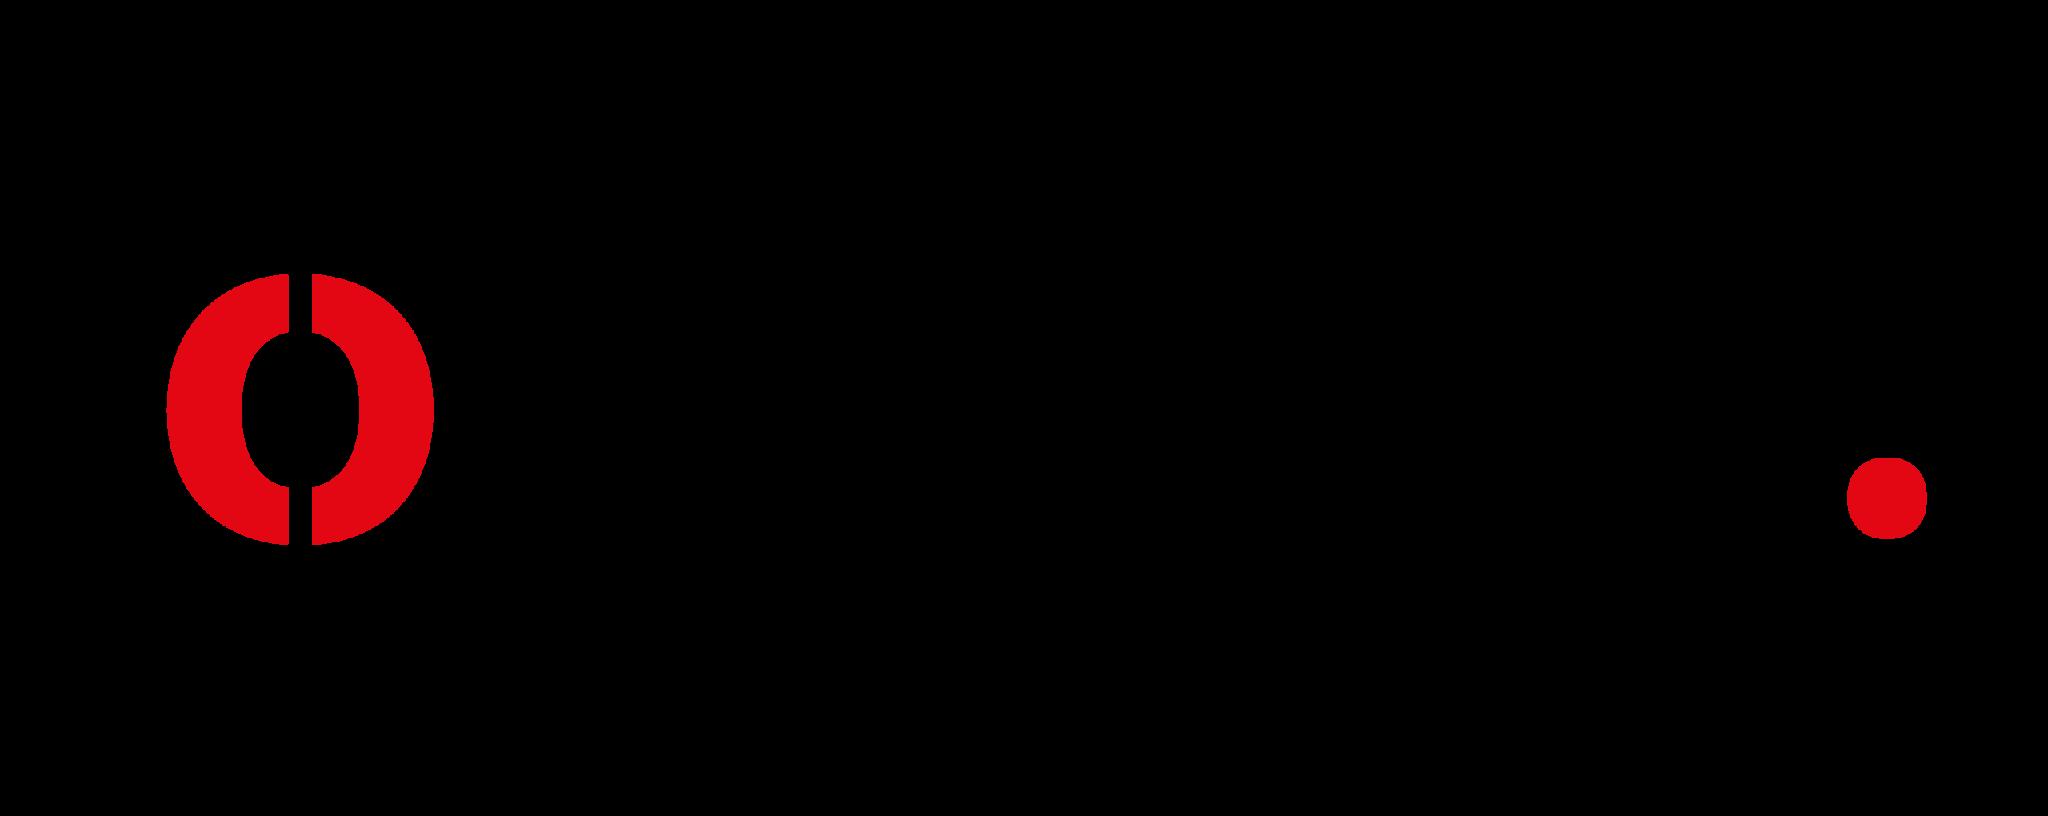 Organic logo (photo credit: Organic)